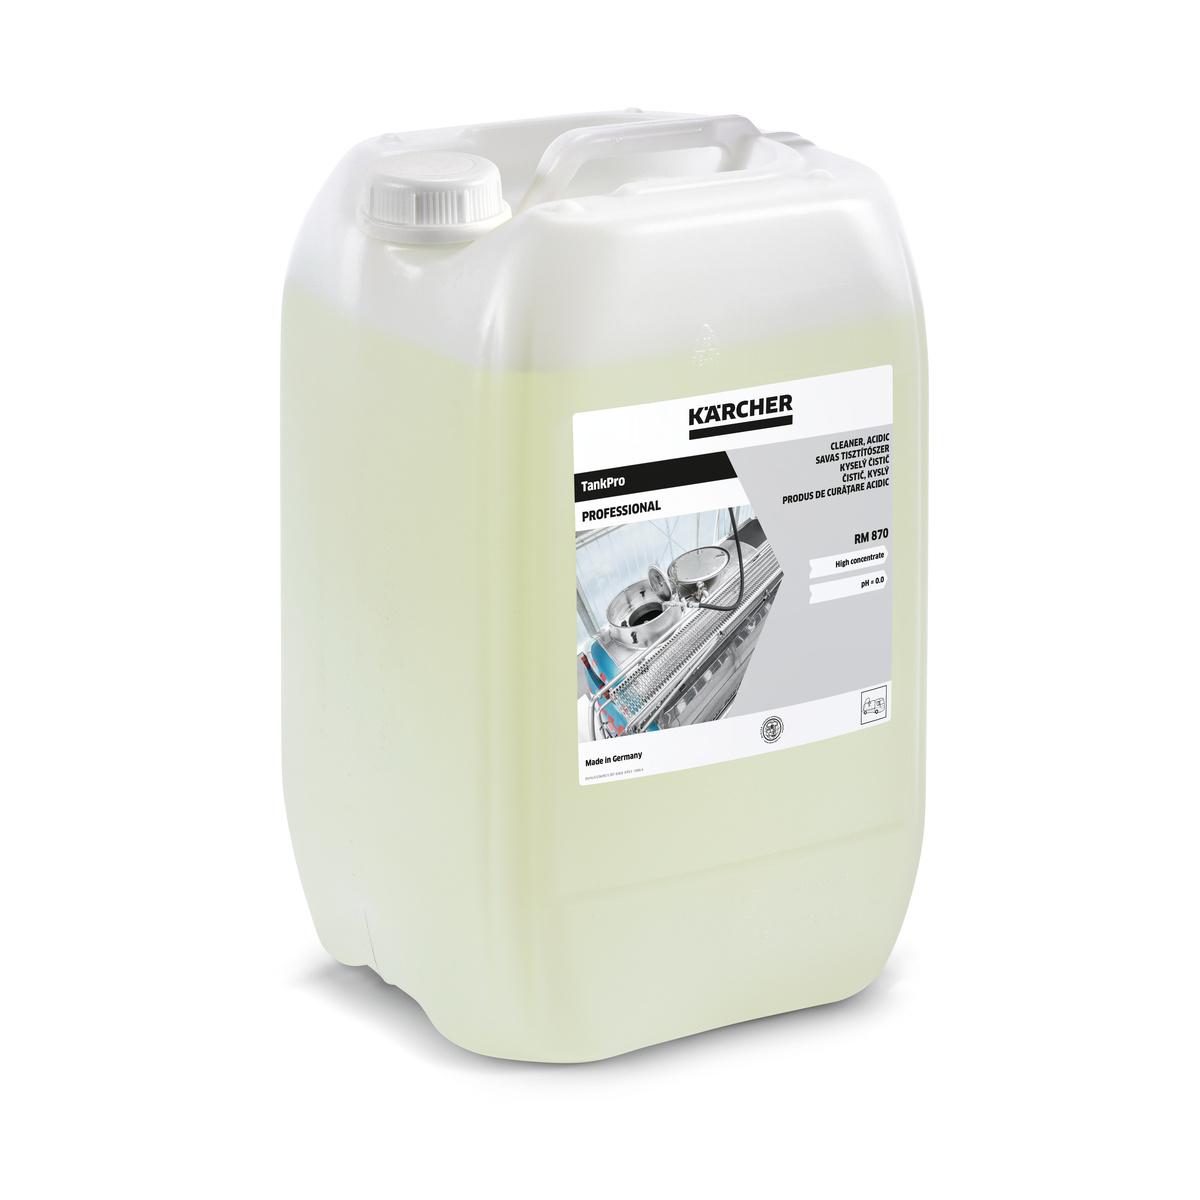 TankPro Reiniger, sauer RM 870, 200L